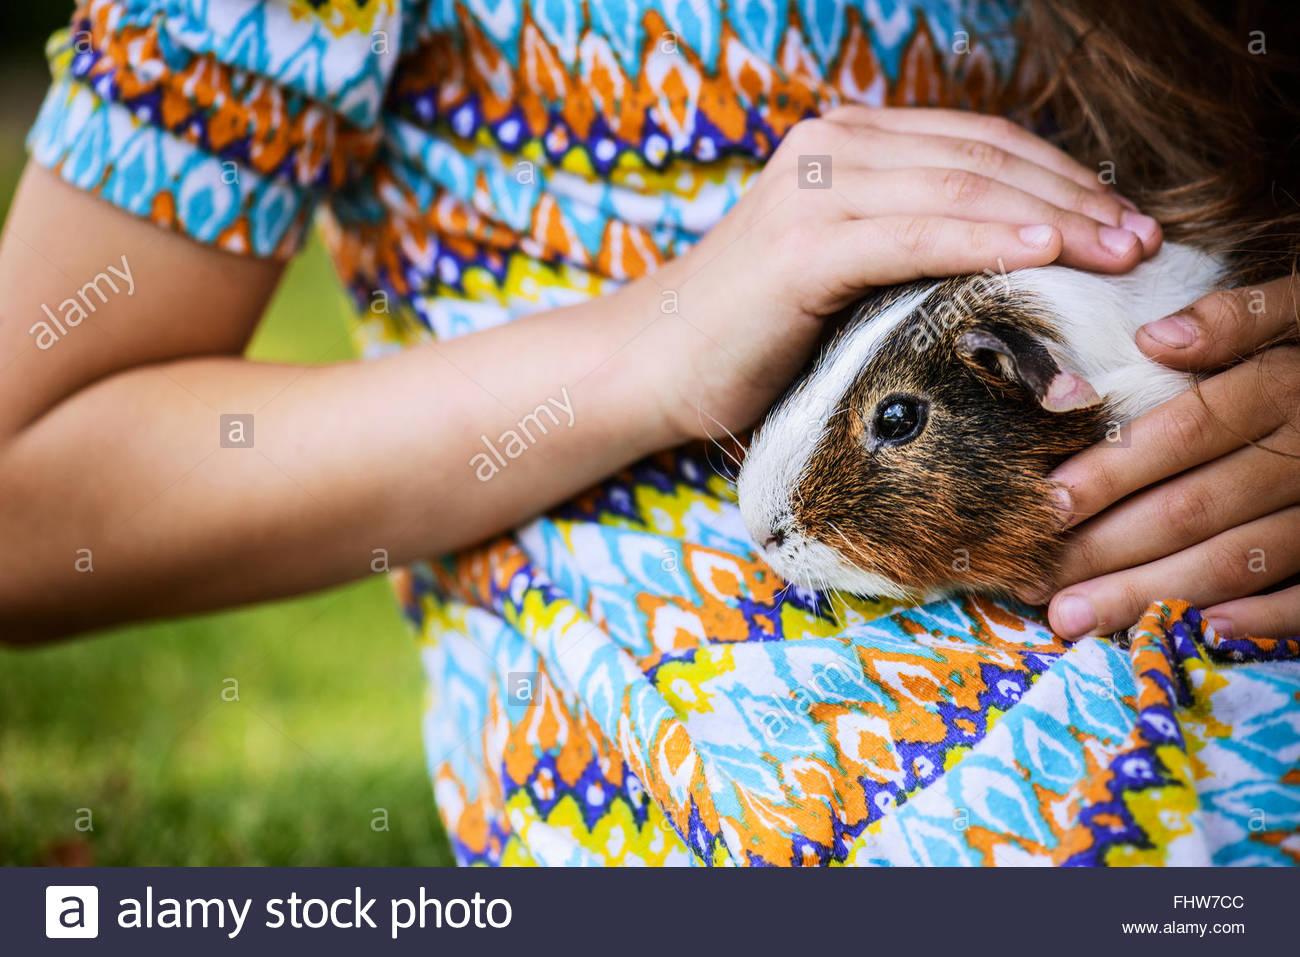 Little girl petting guinea pig - Stock Image